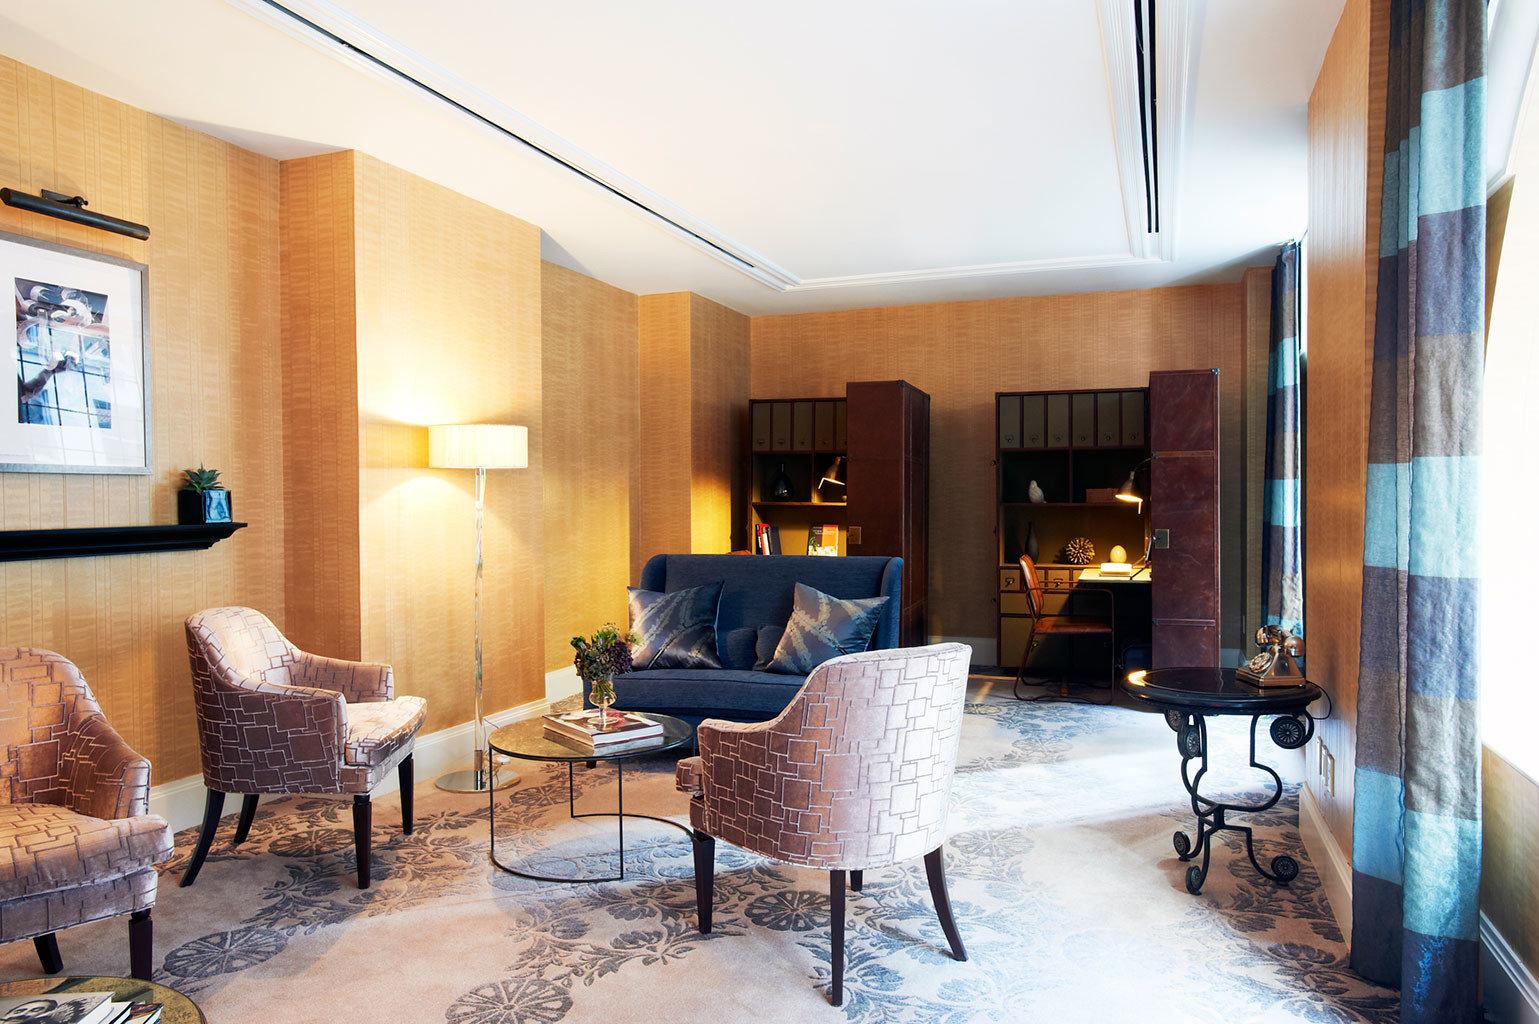 Boutique City Lobby Lounge Modern chair property living room condominium home Suite Villa mansion cottage